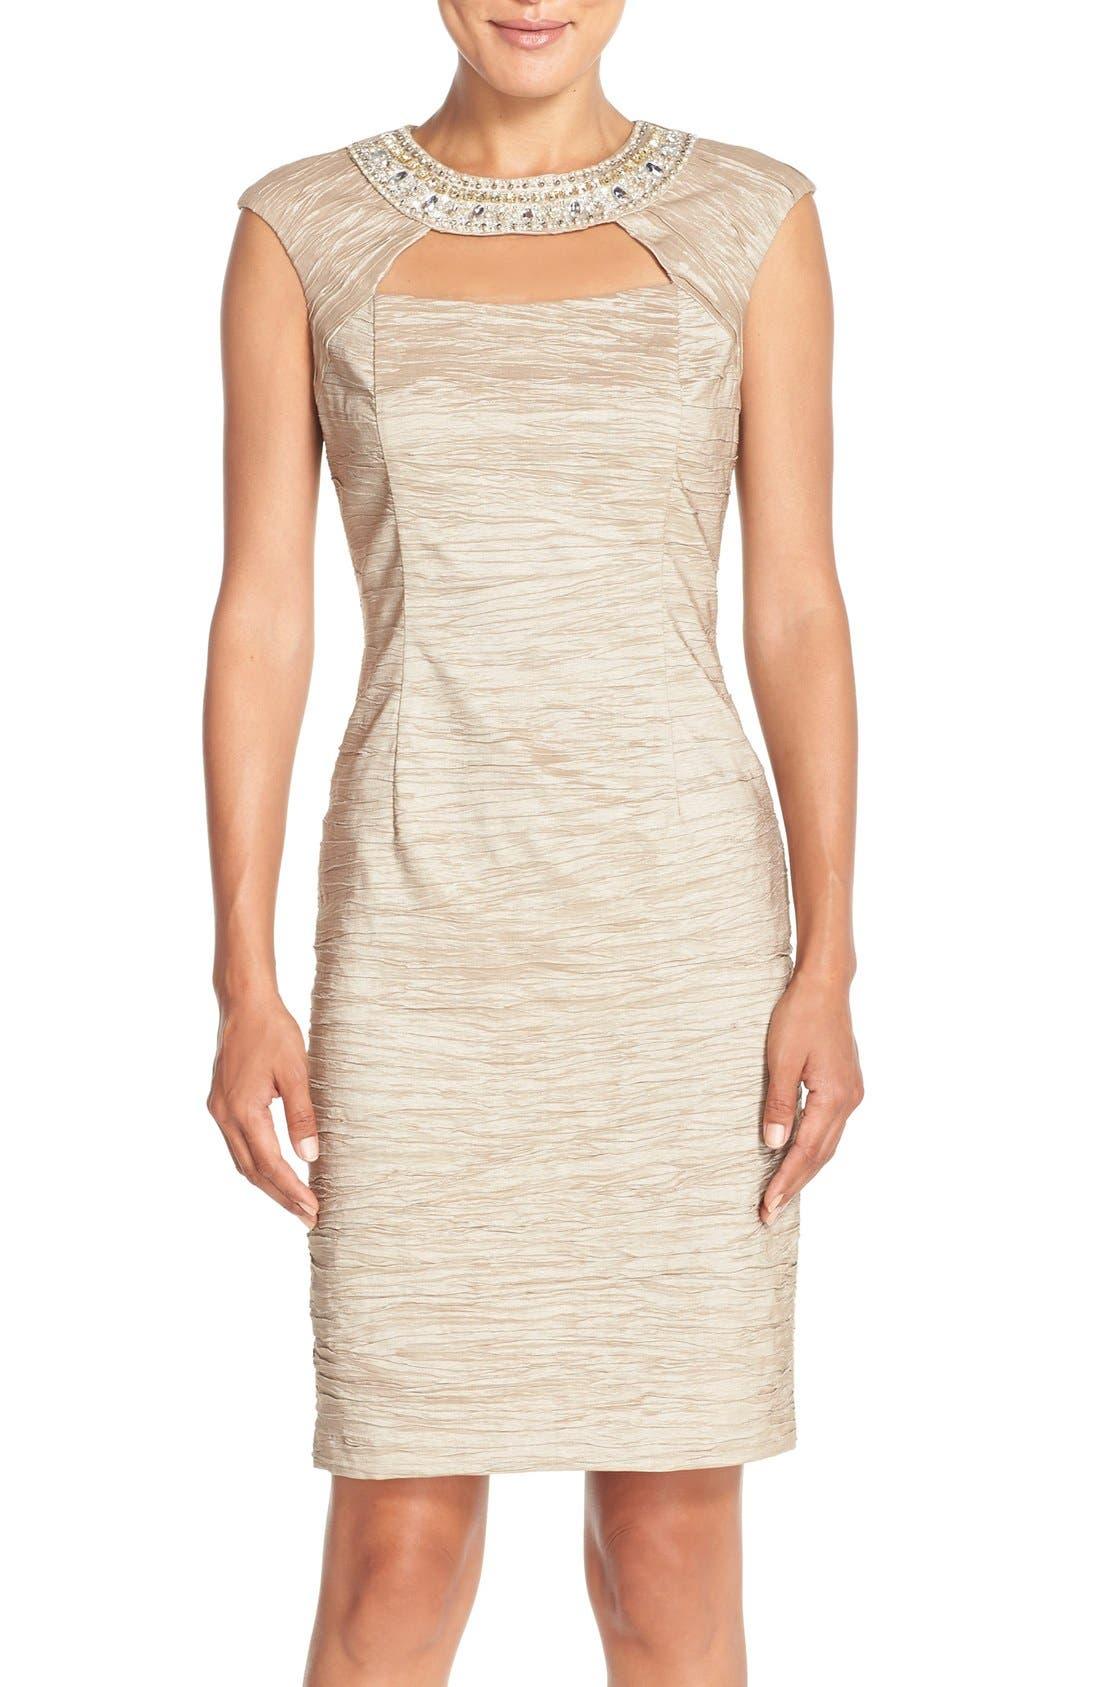 Embellished Crushed Taffeta Sheath Dress,                         Main,                         color, Champagne